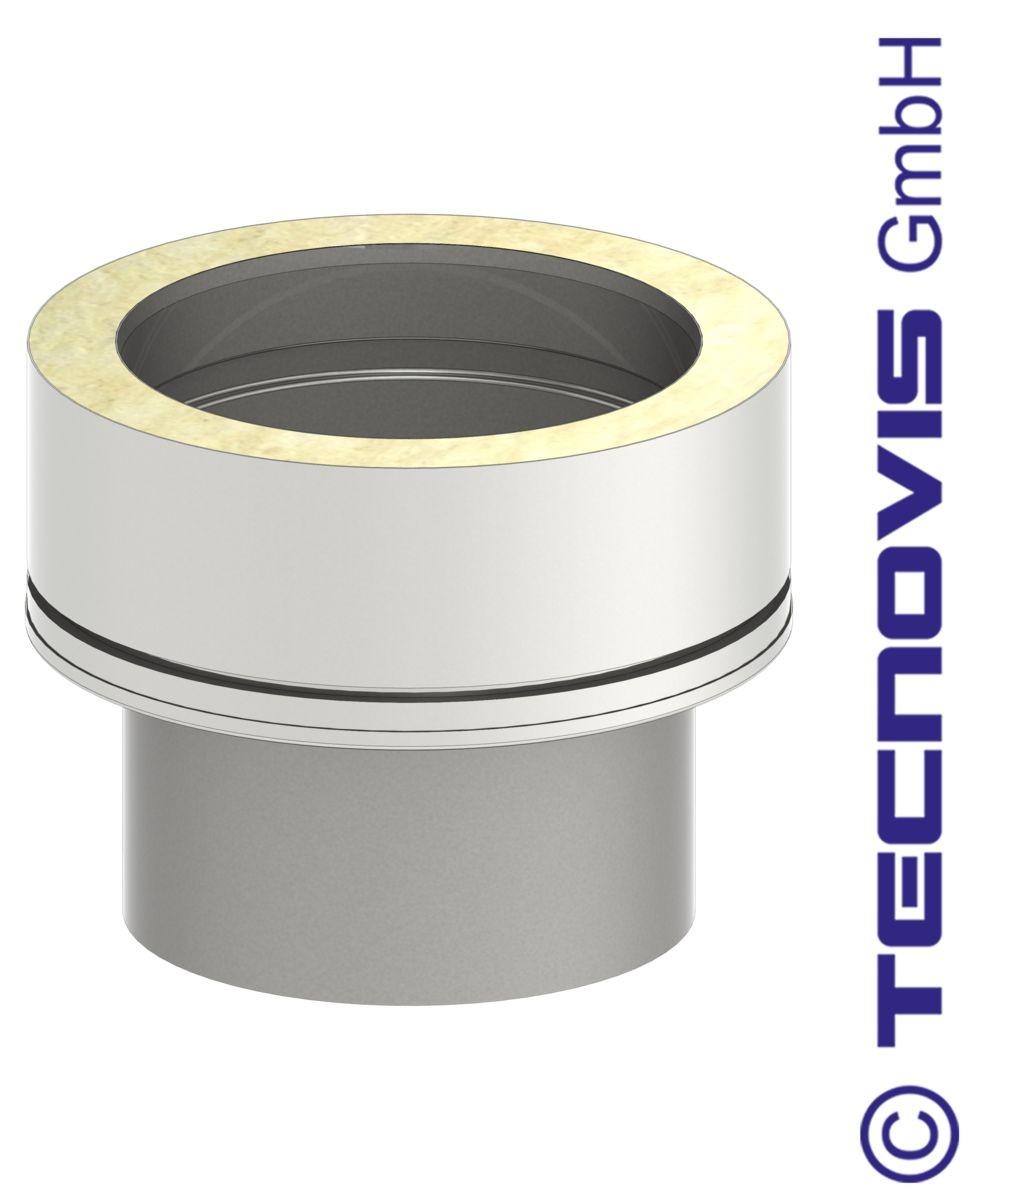 Adaptateur INOX simple - double paroi sur tubage inox